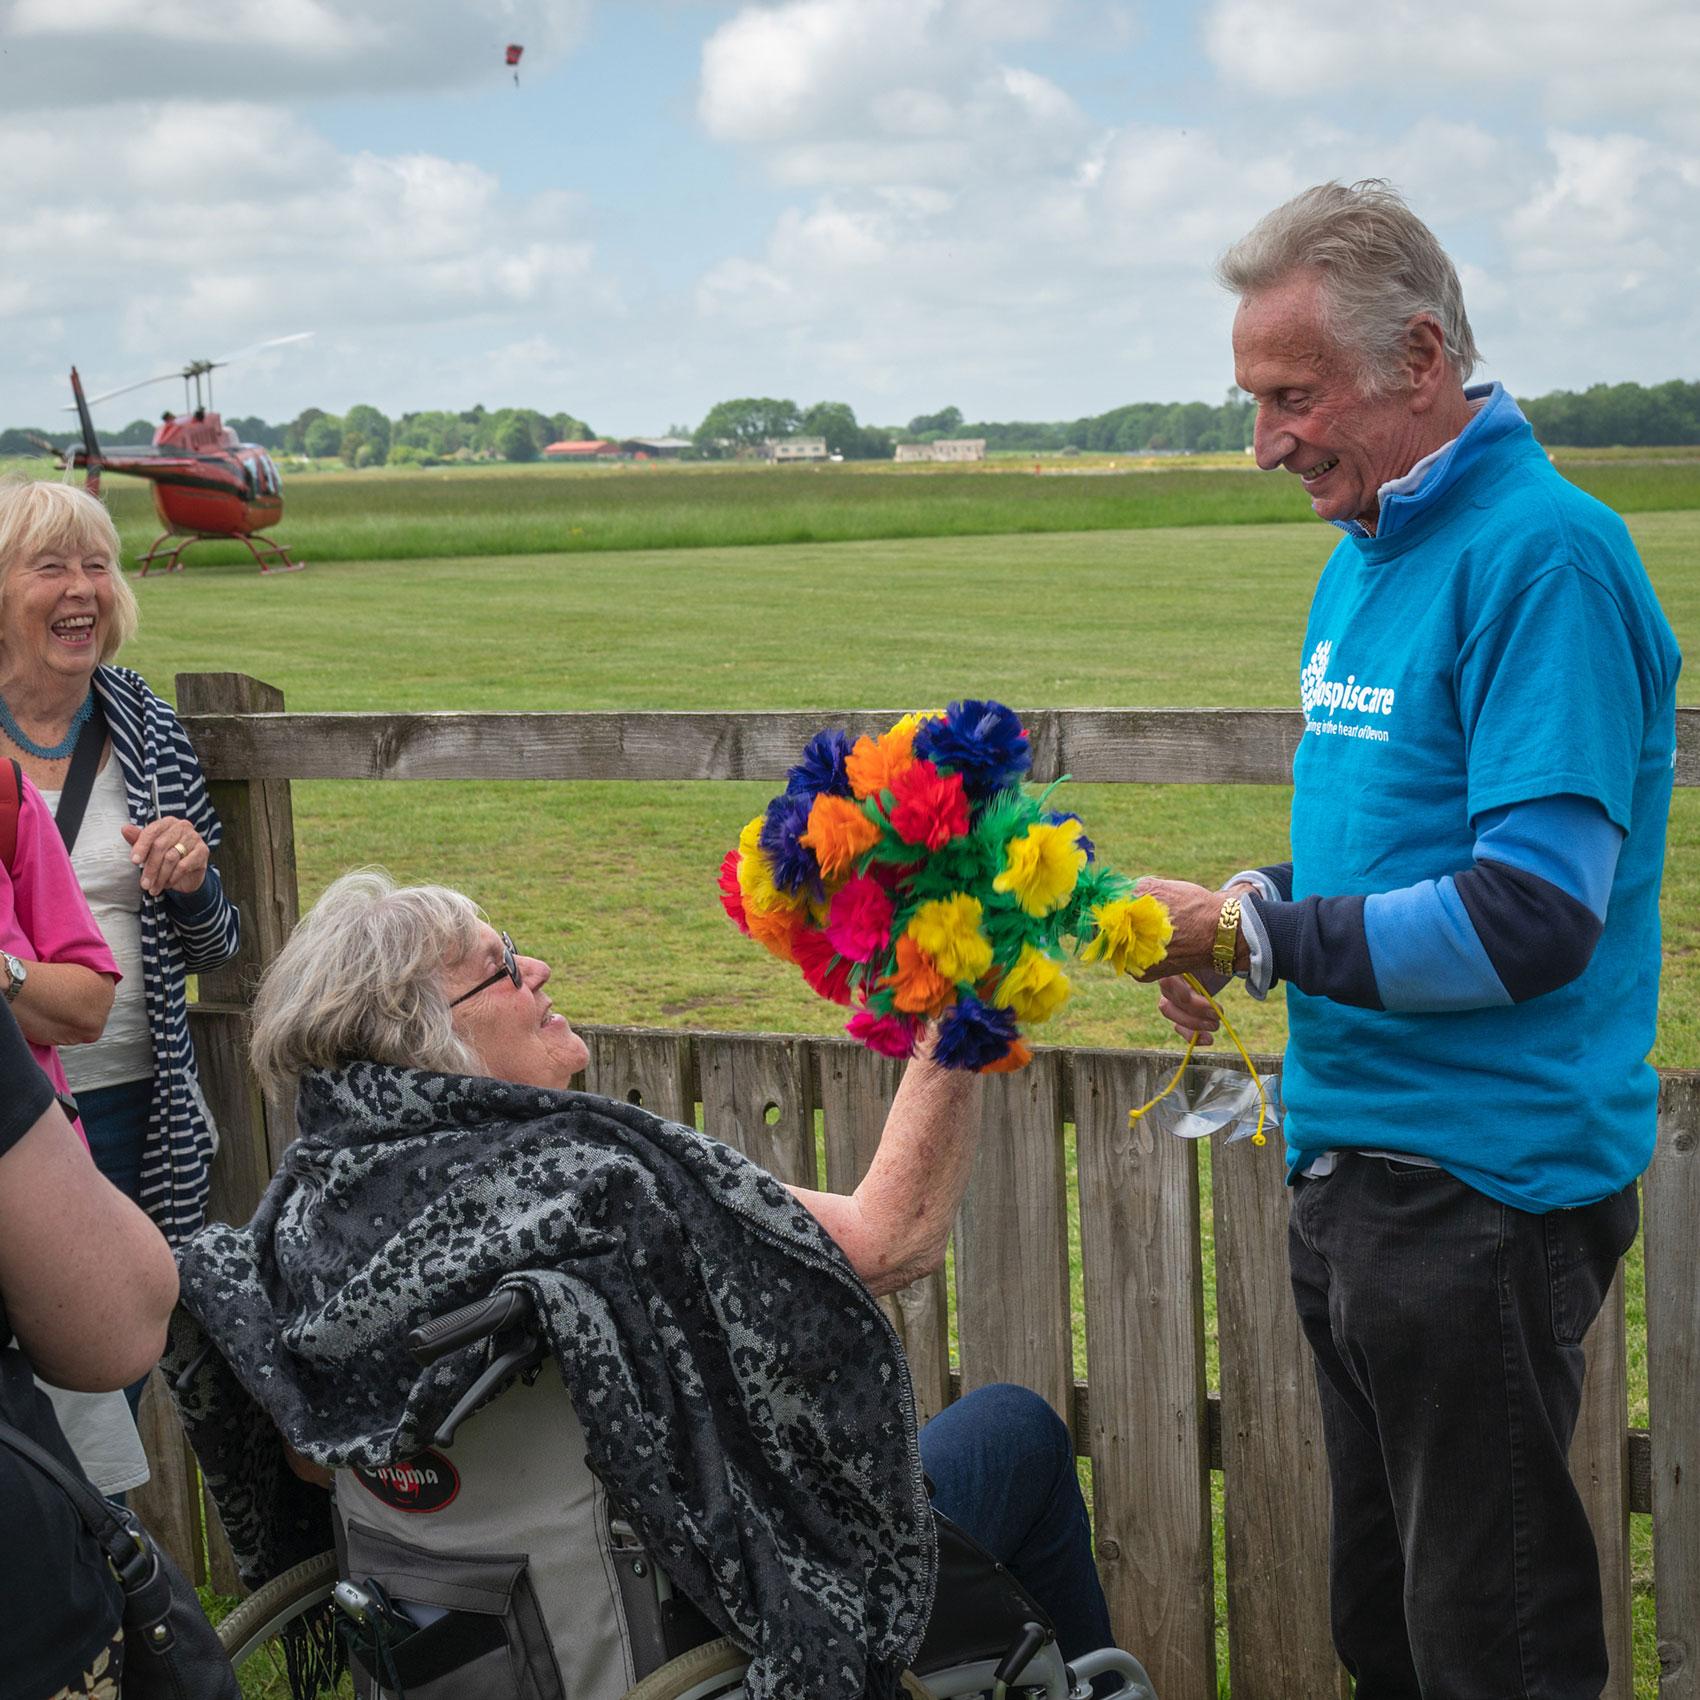 Bill's story: Celebrating my 82nd birthday for Hospiscare